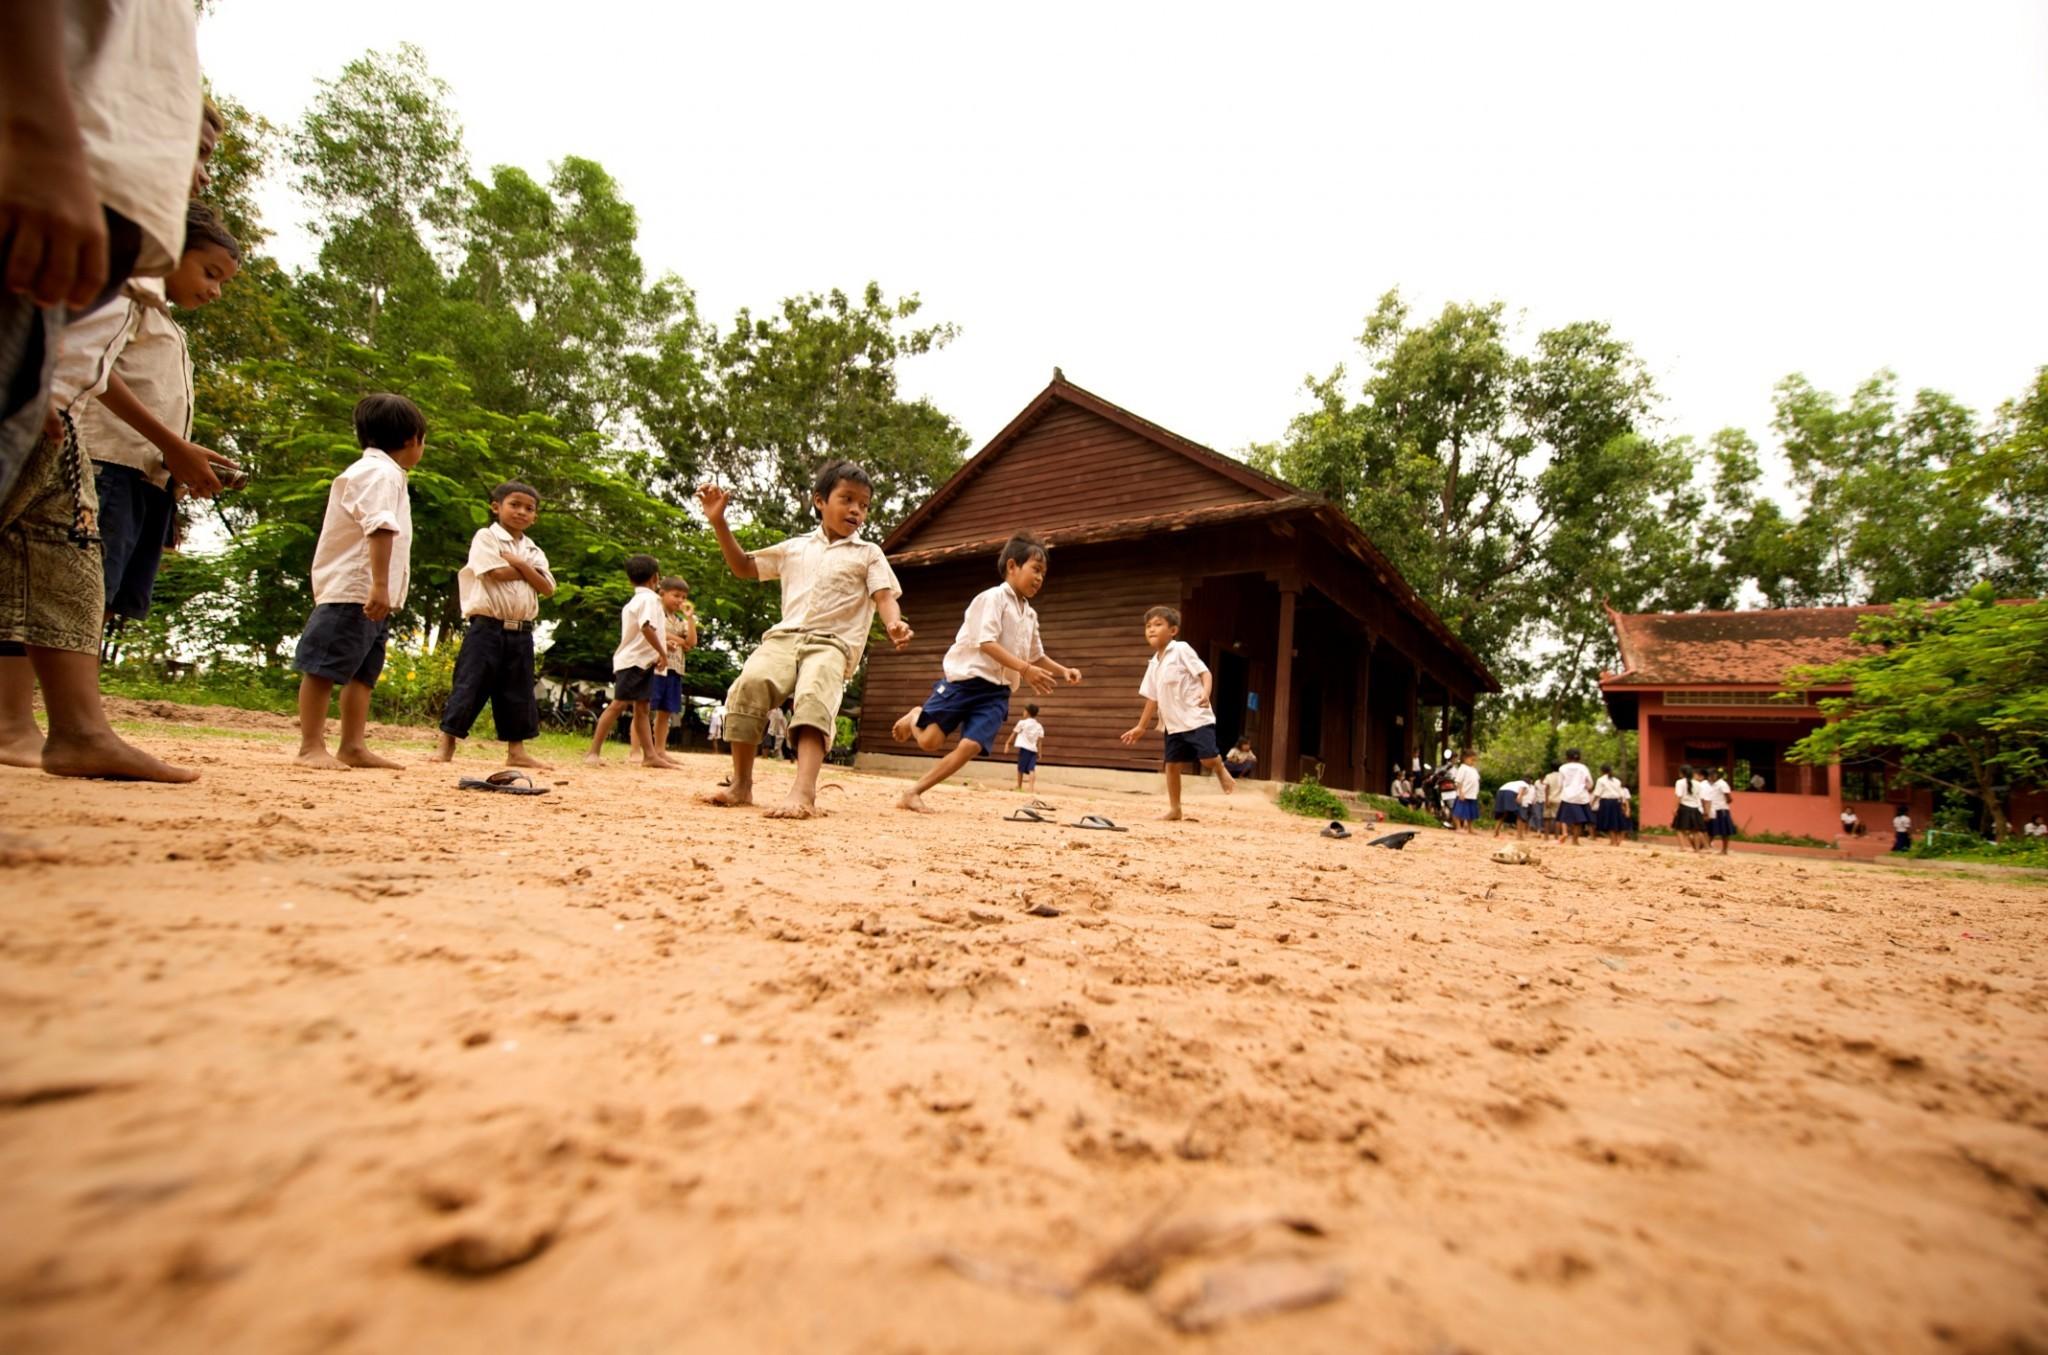 AlexSoh_July09 Cambodia040